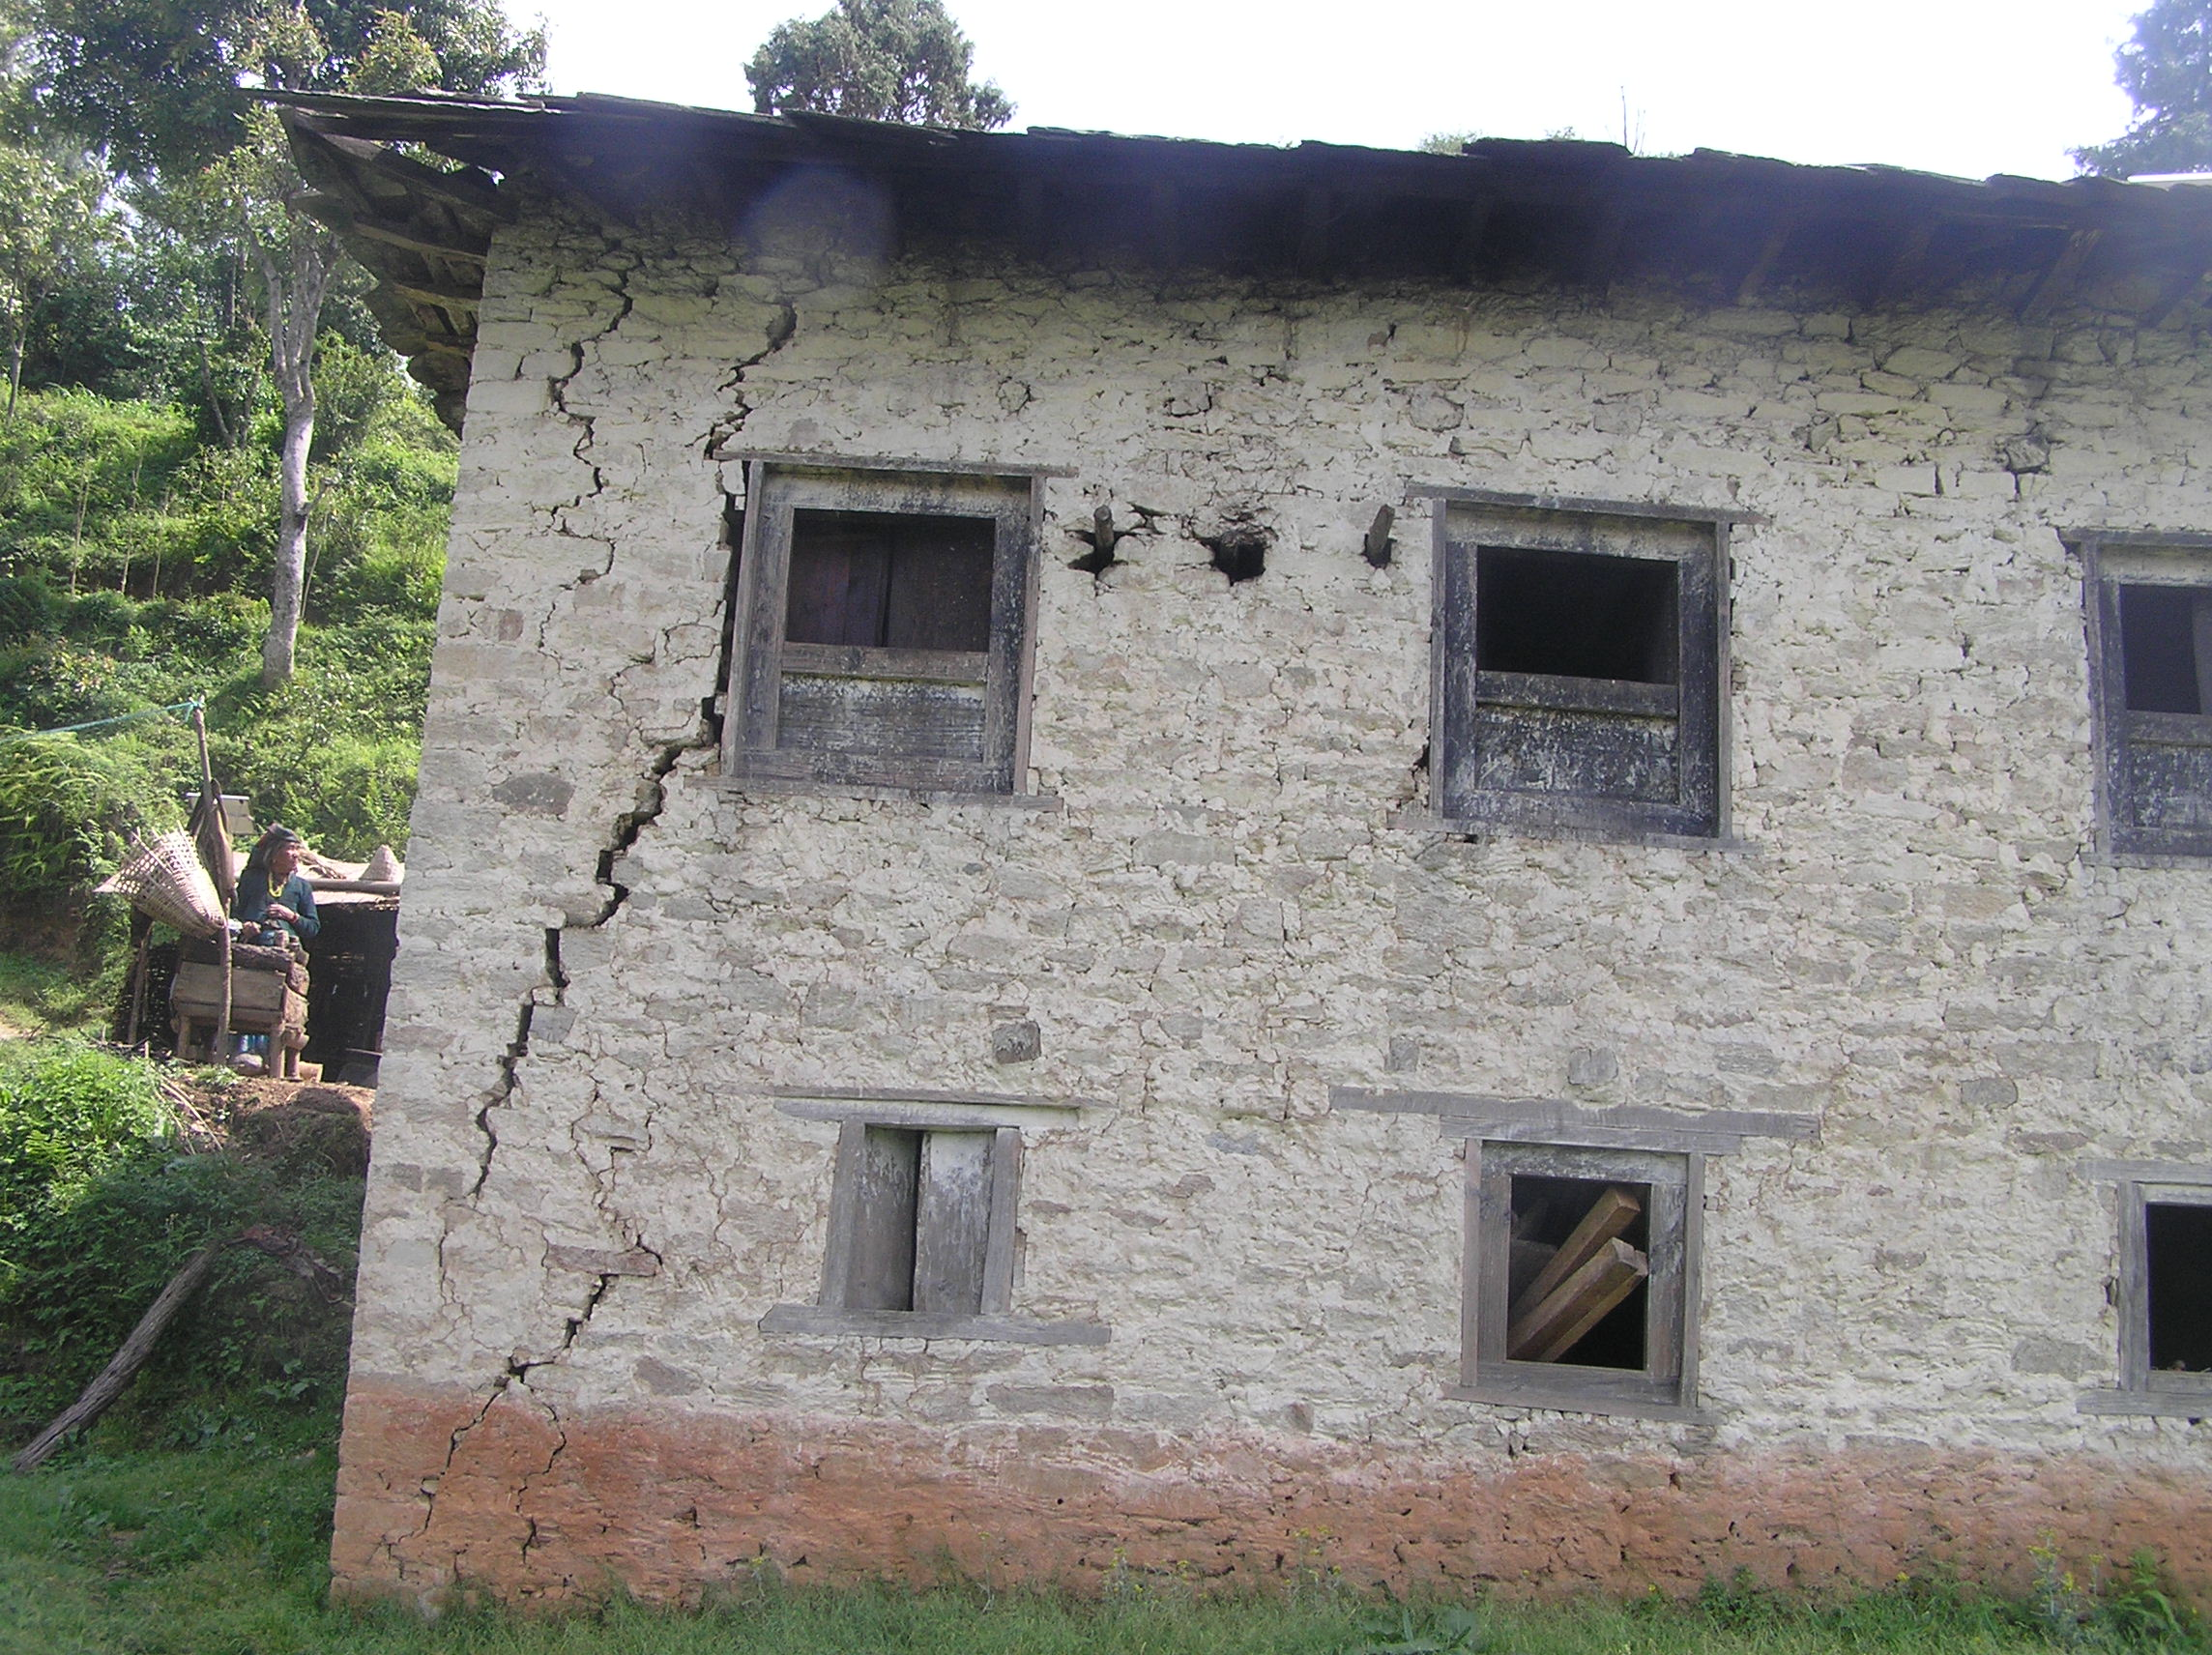 padam-bhadur-tamangsuk-bir-house-dublay